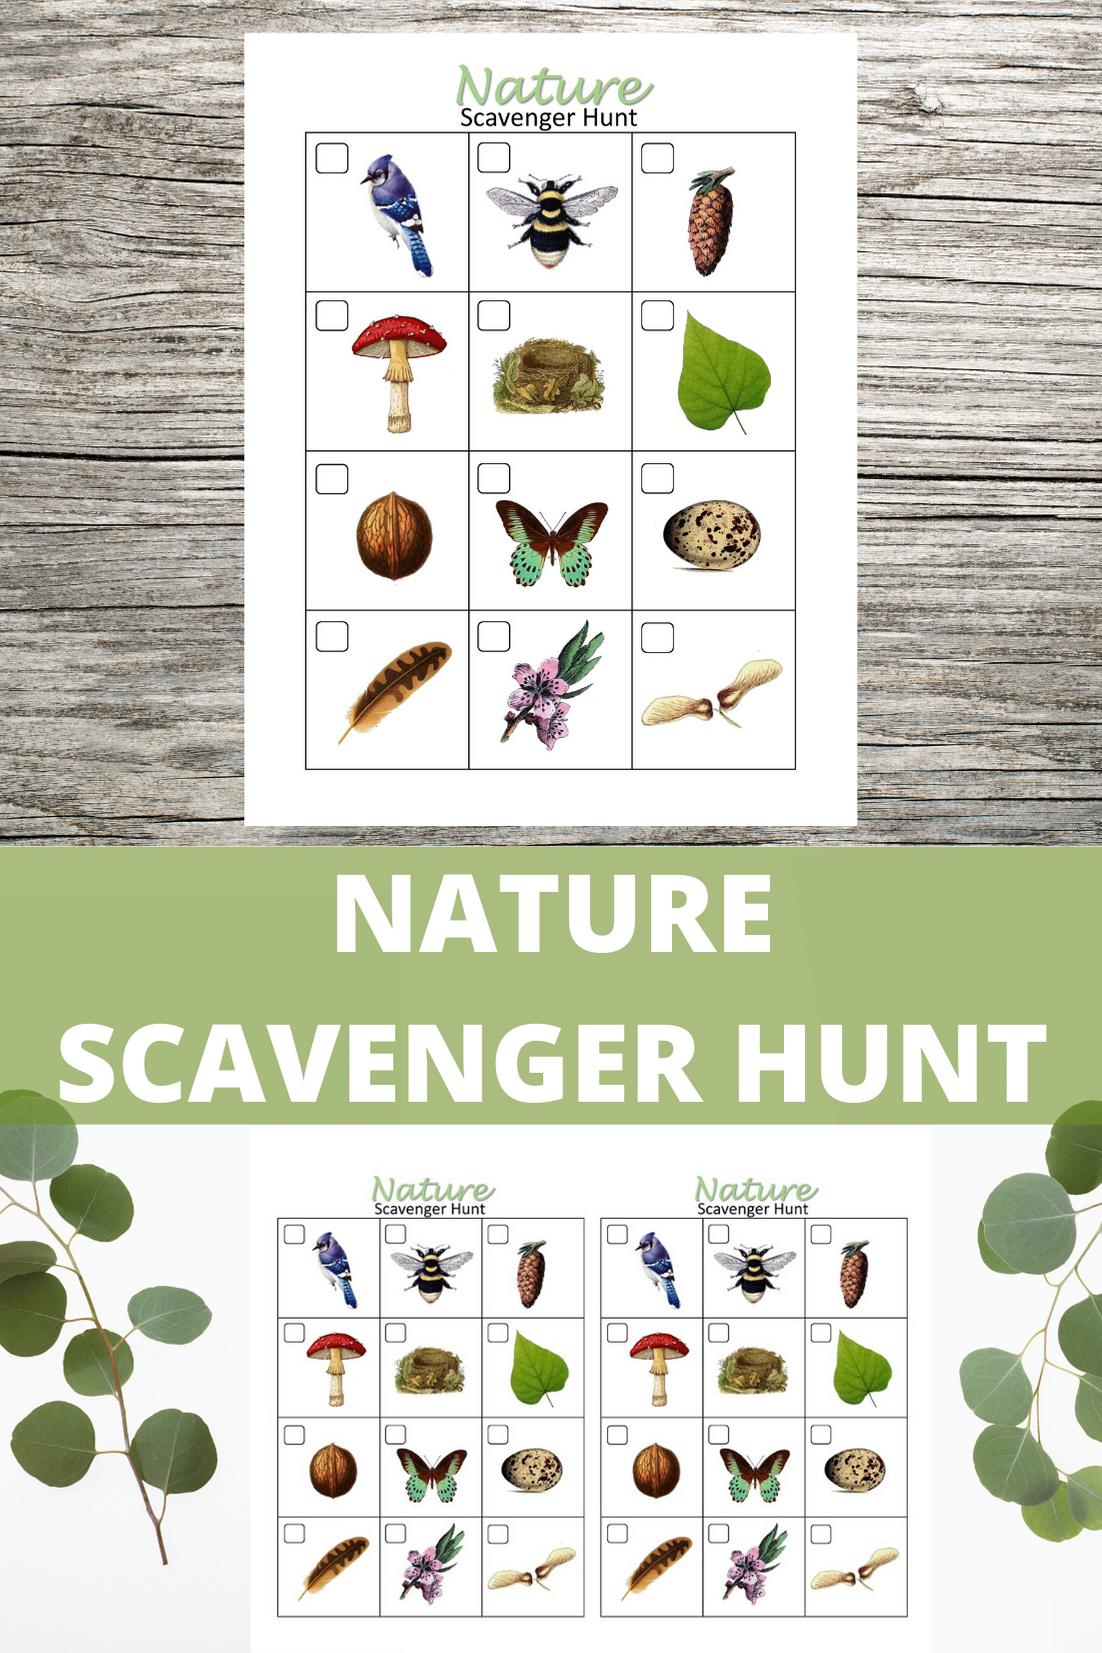 Nature Scavenger Hunt For Kids Printable Outdoor Game